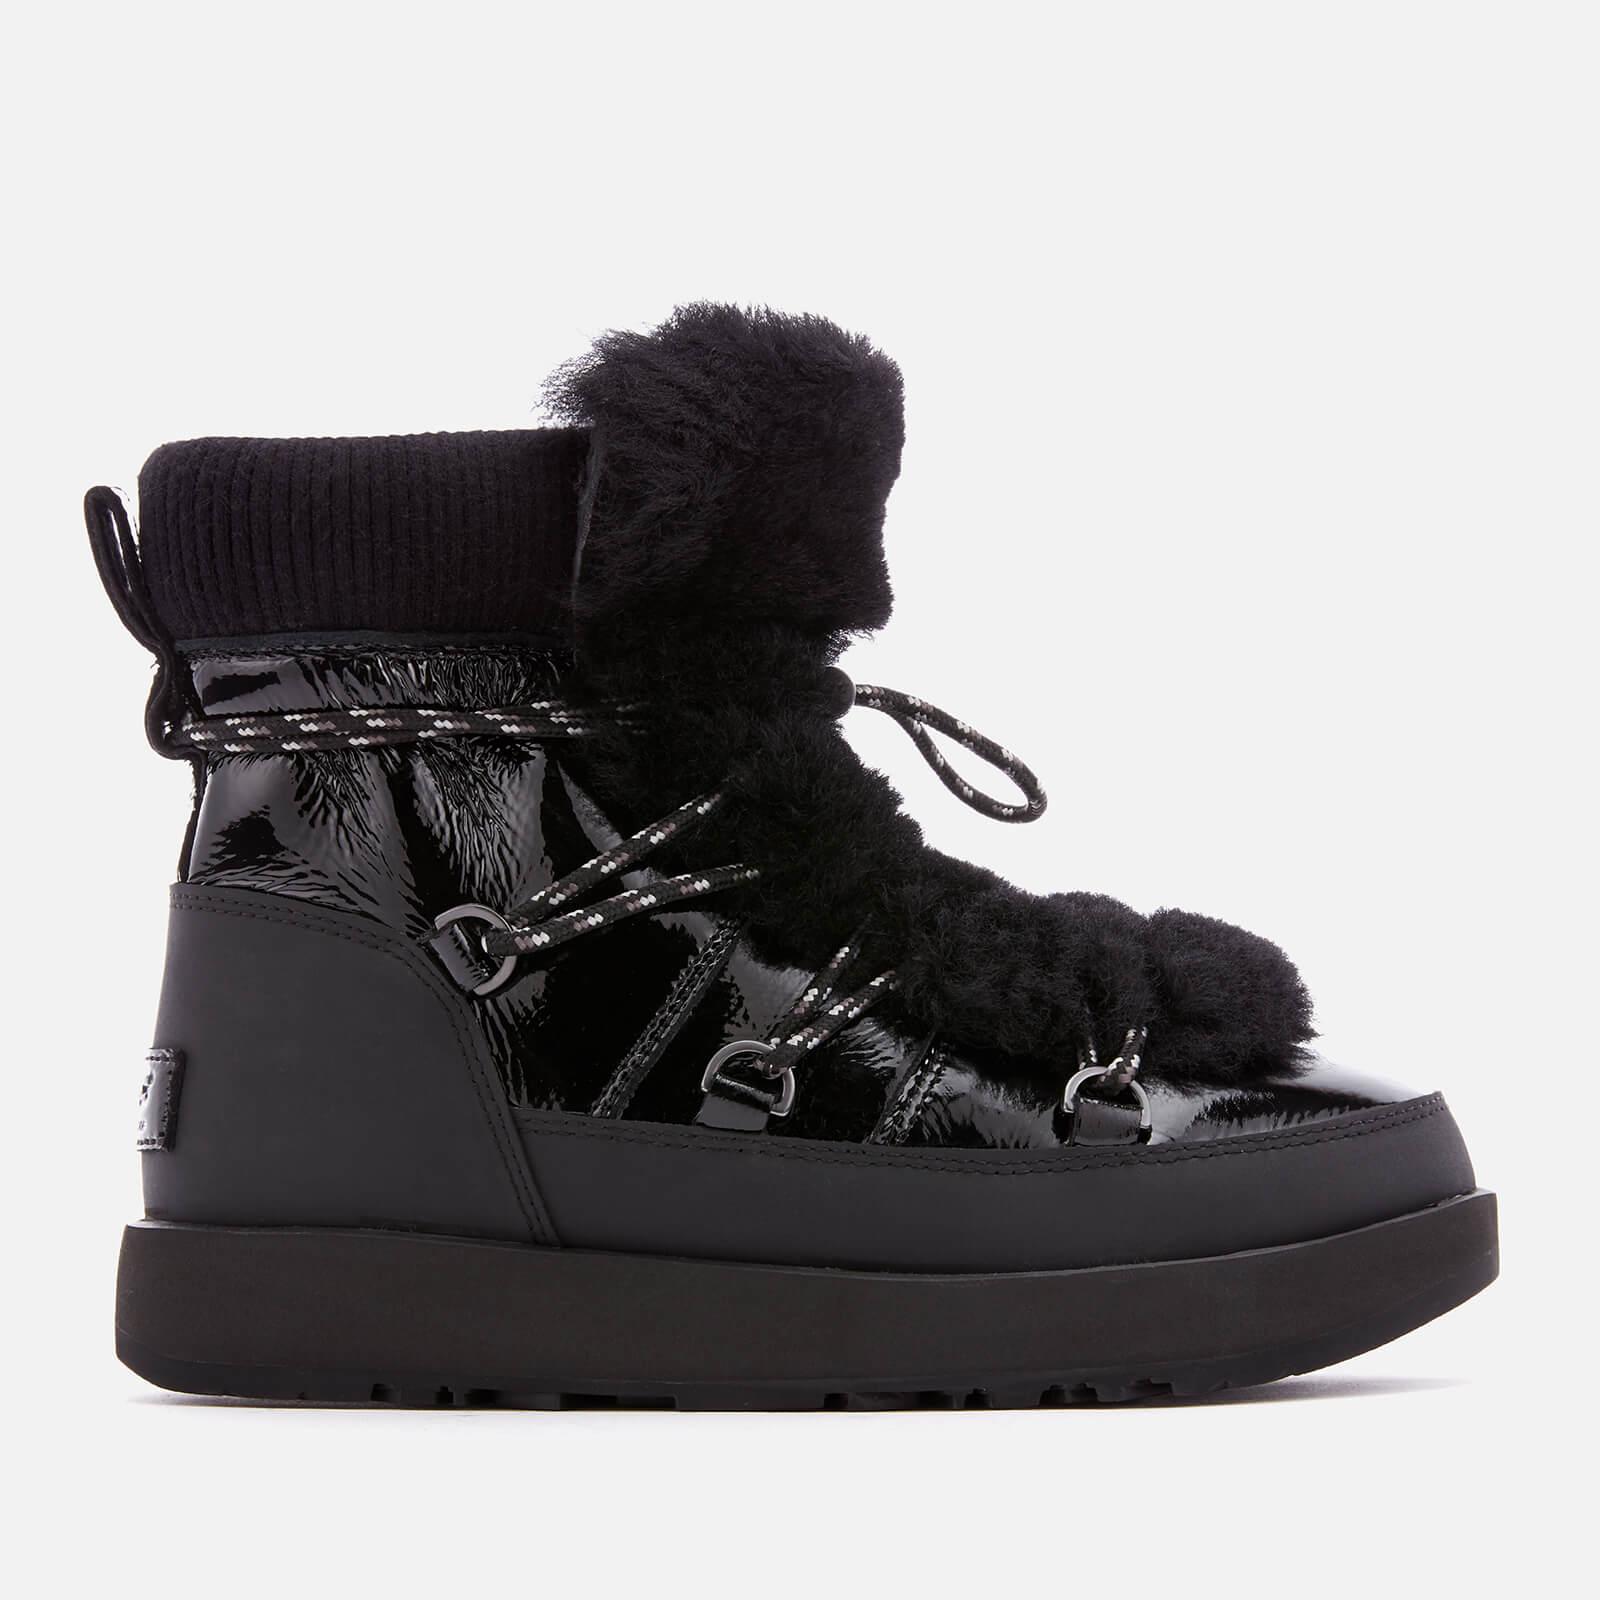 039672d2fb6 UGG Women's Highland Waterproof Boots - Black